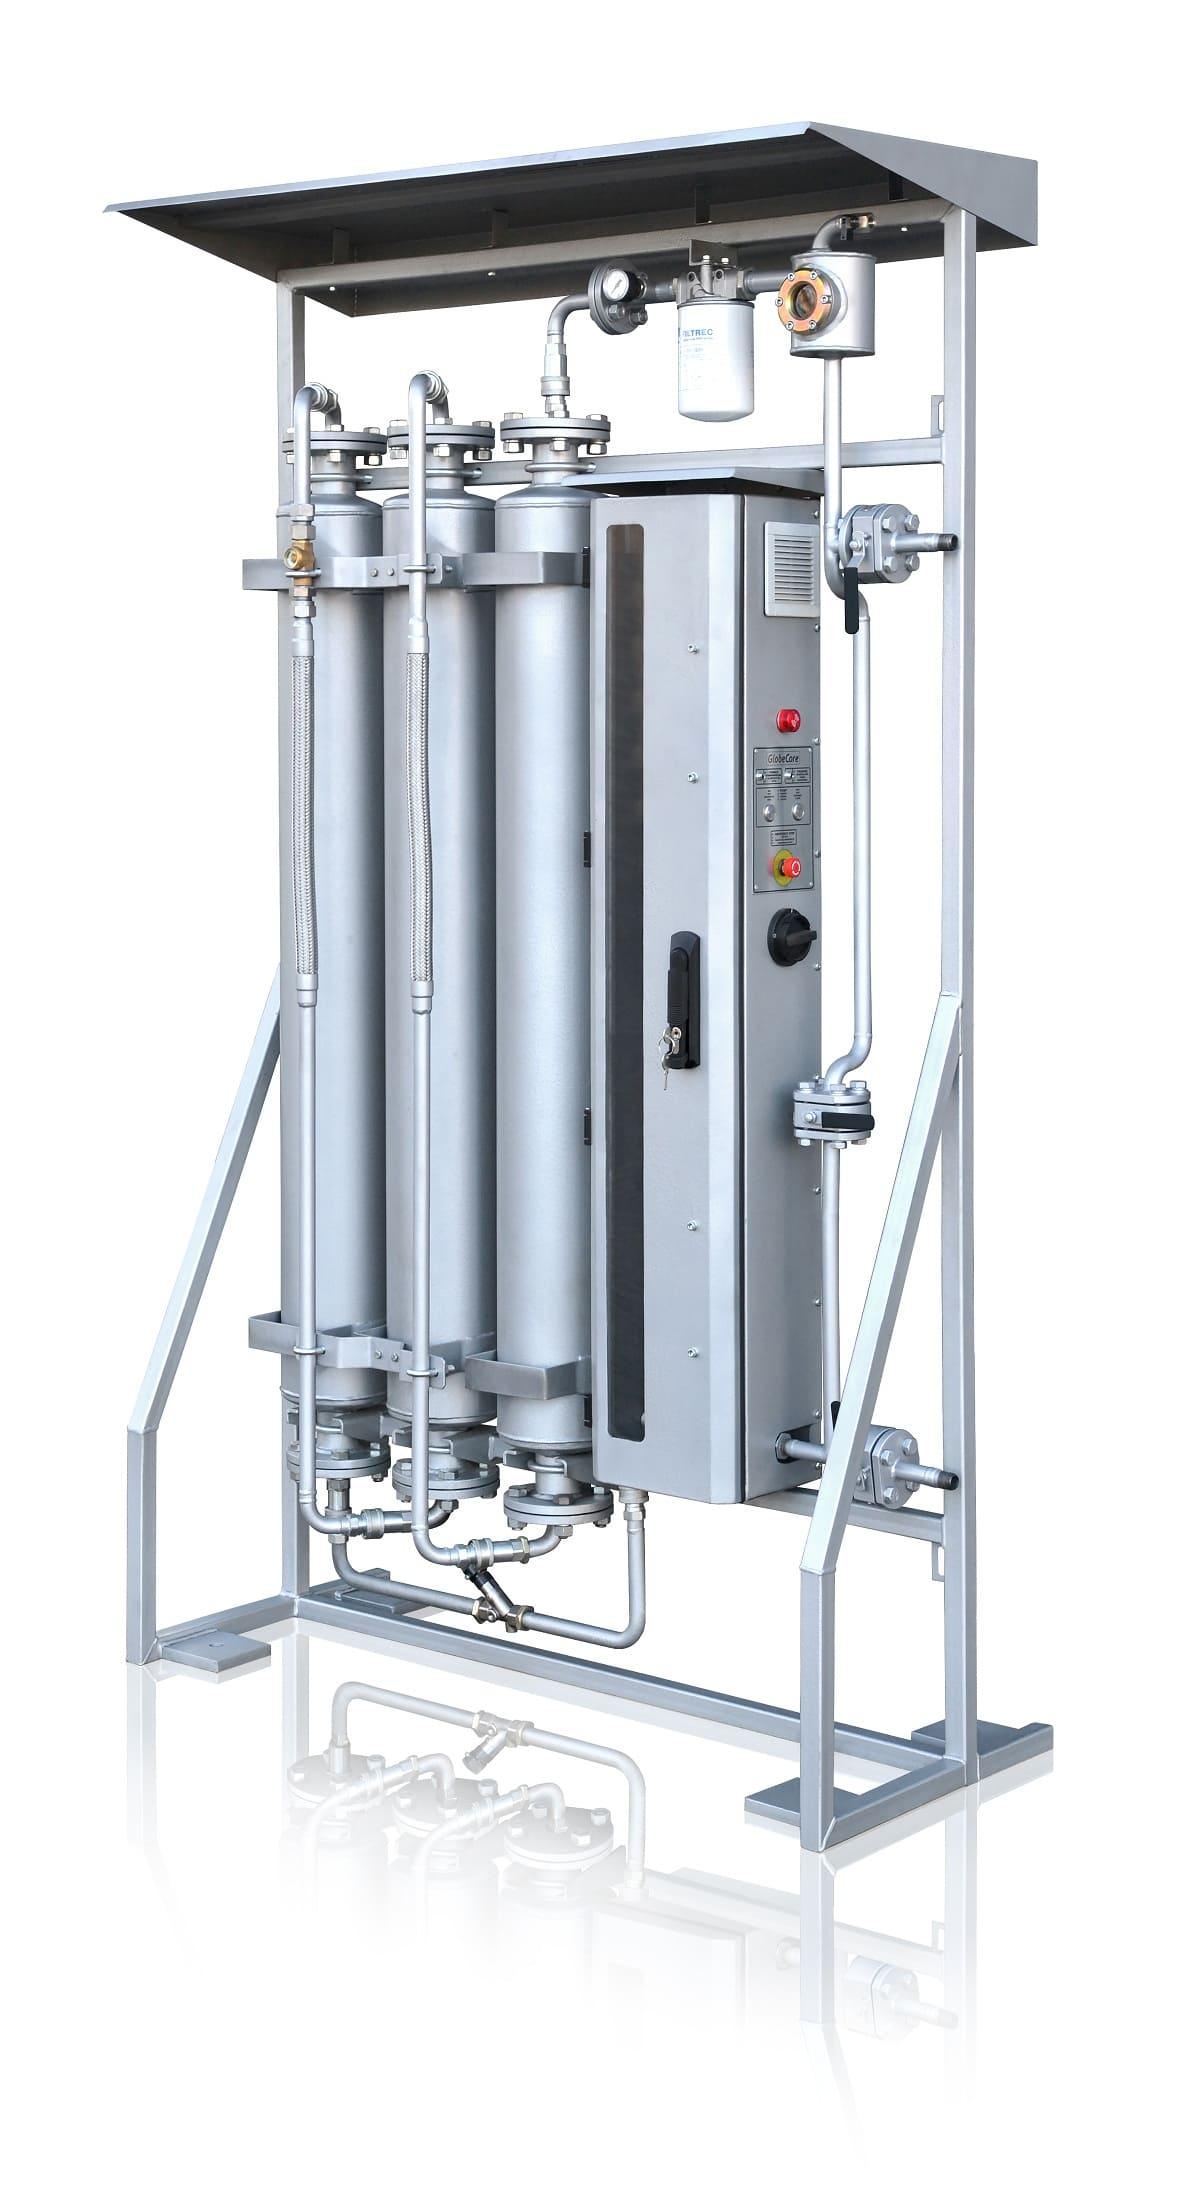 Transformer Drying Unit